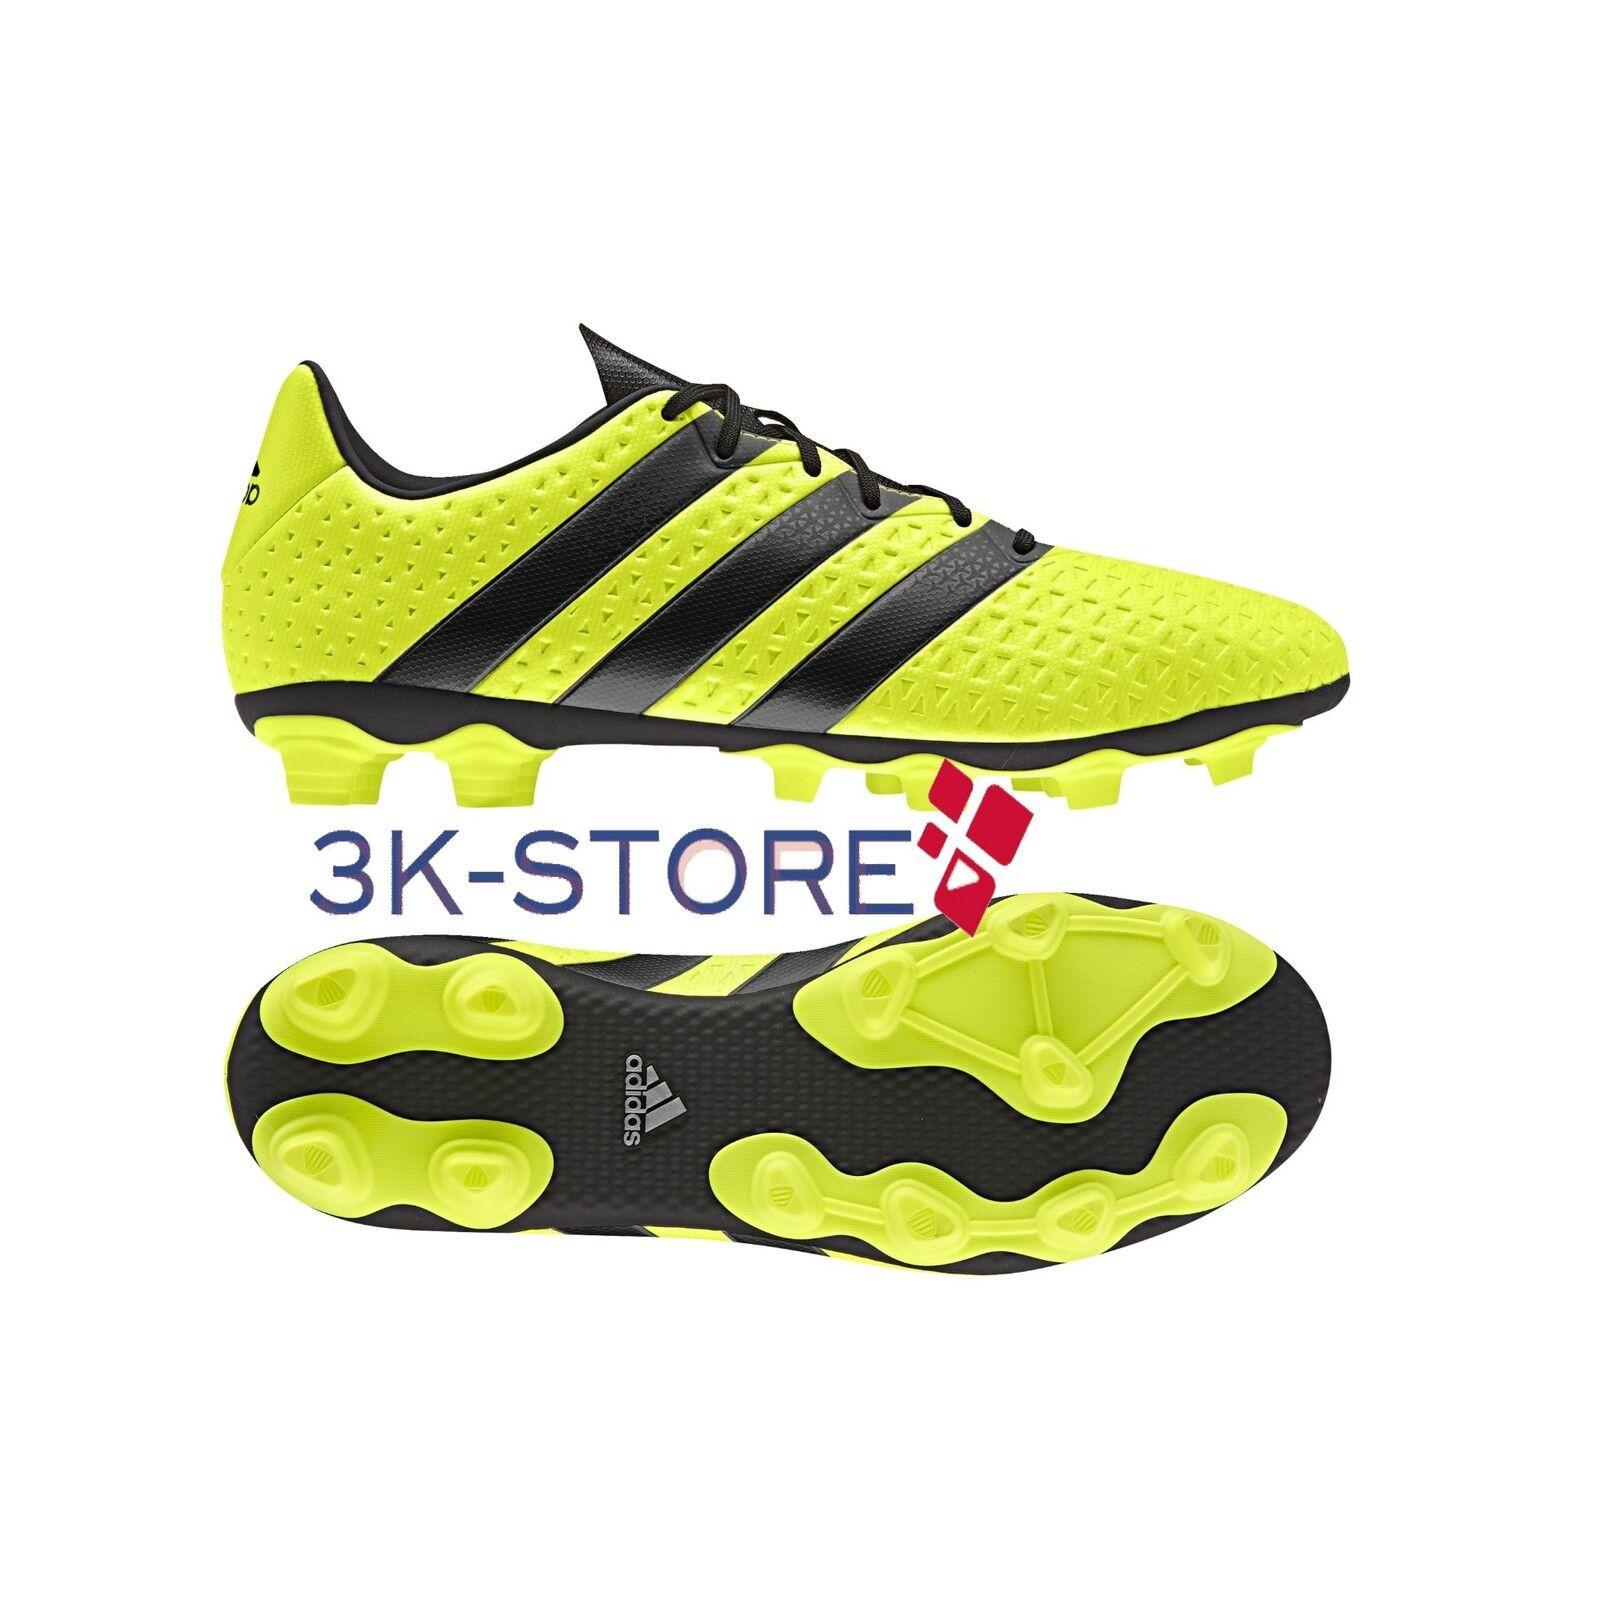 new styles d0891 12a4b ... ADIDAS SHOES MAN MAN MAN FOOTBALL SOCCER MESSI GLgold X ACE 09fbd8 ...